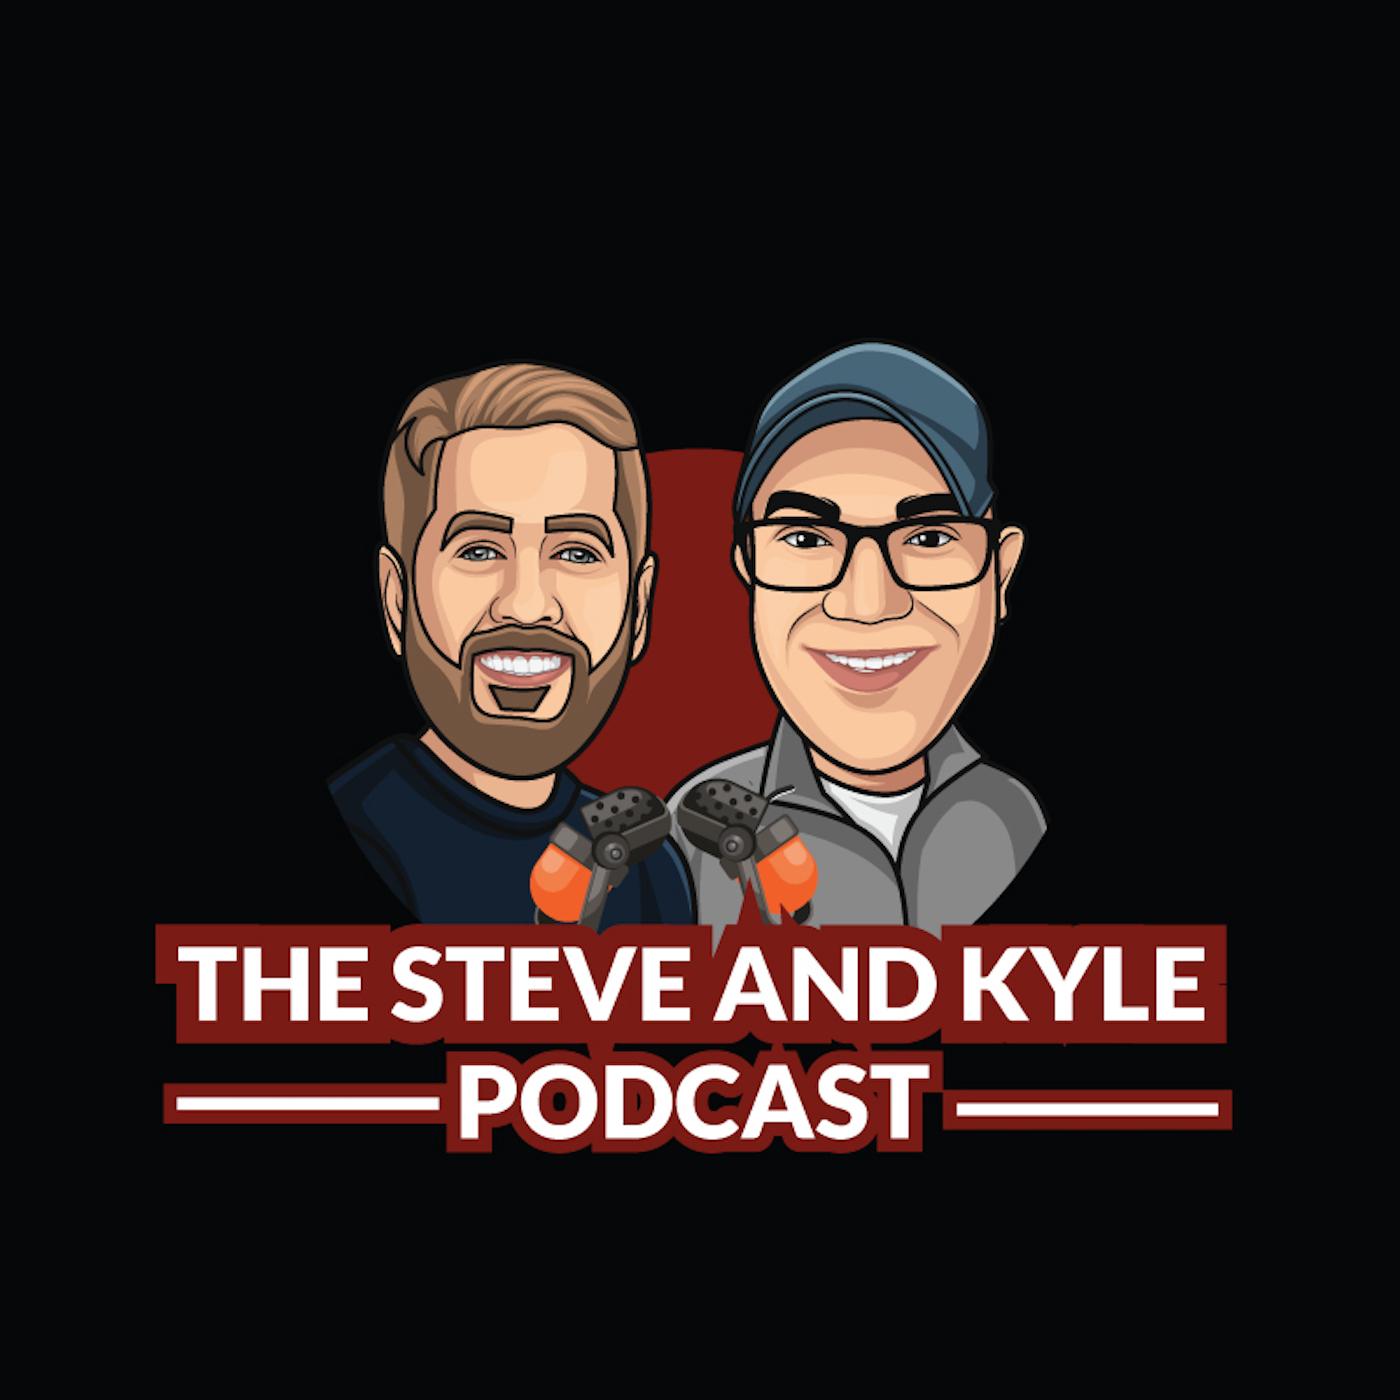 The Steve and Kyle Podcast show art